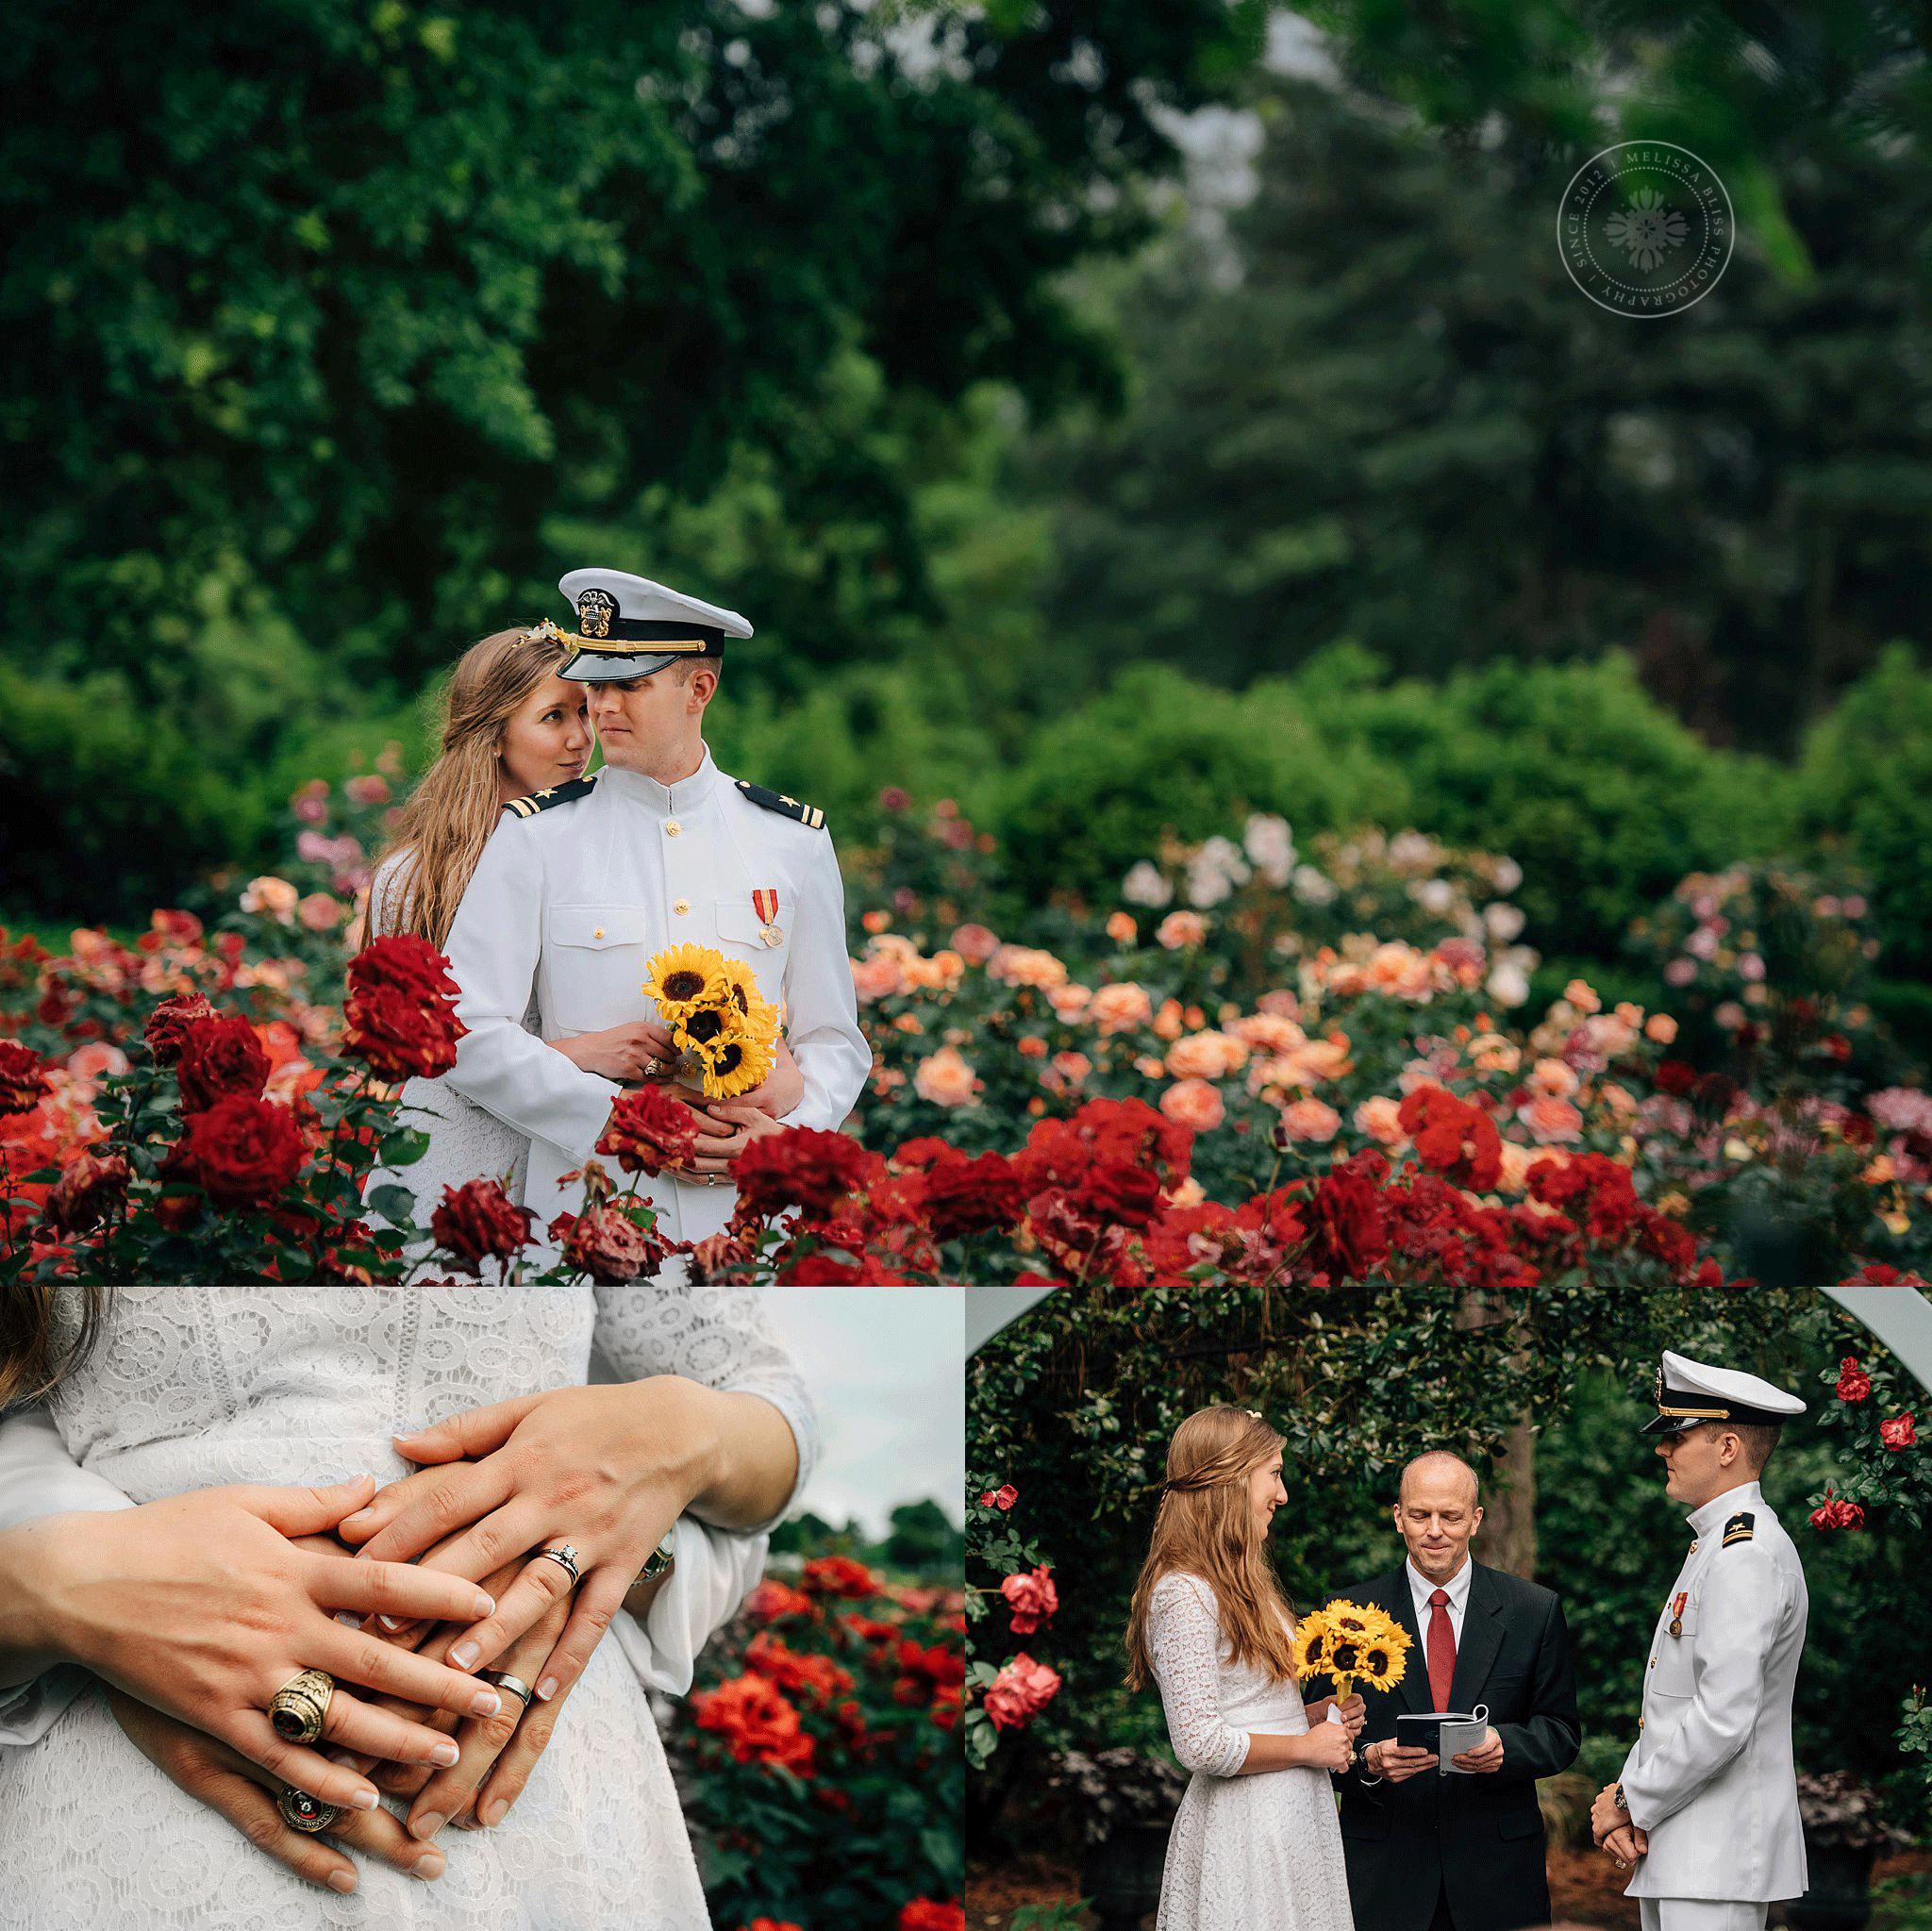 Norfolk-botanical-gardens-wedding-photography-rose-garden-portraits-norfolk-portsmouth-virginia-beach-wedding-photographer-melissa-bliss-photography